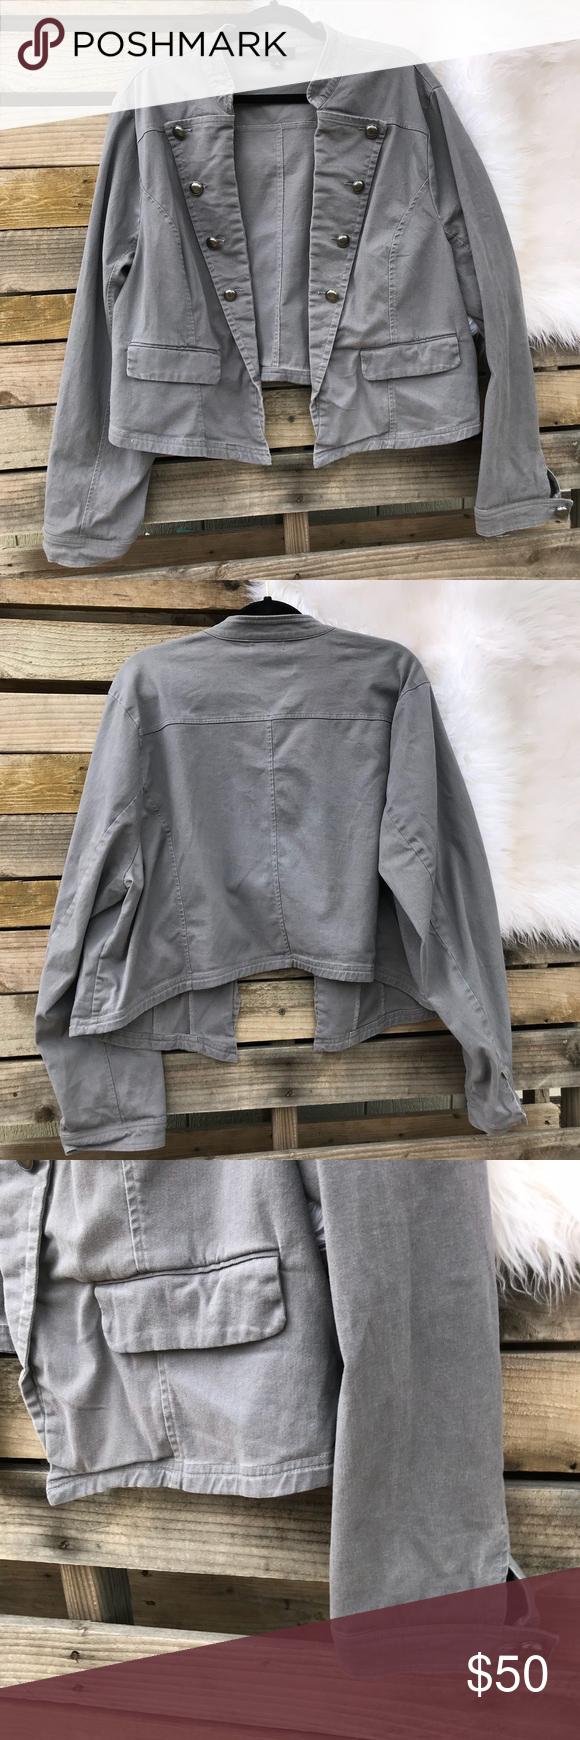 "eb399b952c7 Torrid Womens Gray Jacket Size 4 Plus Size - Torrid - Gray Jacket - Great  Condition - Size 4 Measures Approximately  Length  20 1 2"" Chest  27"" A-61  torrid ..."